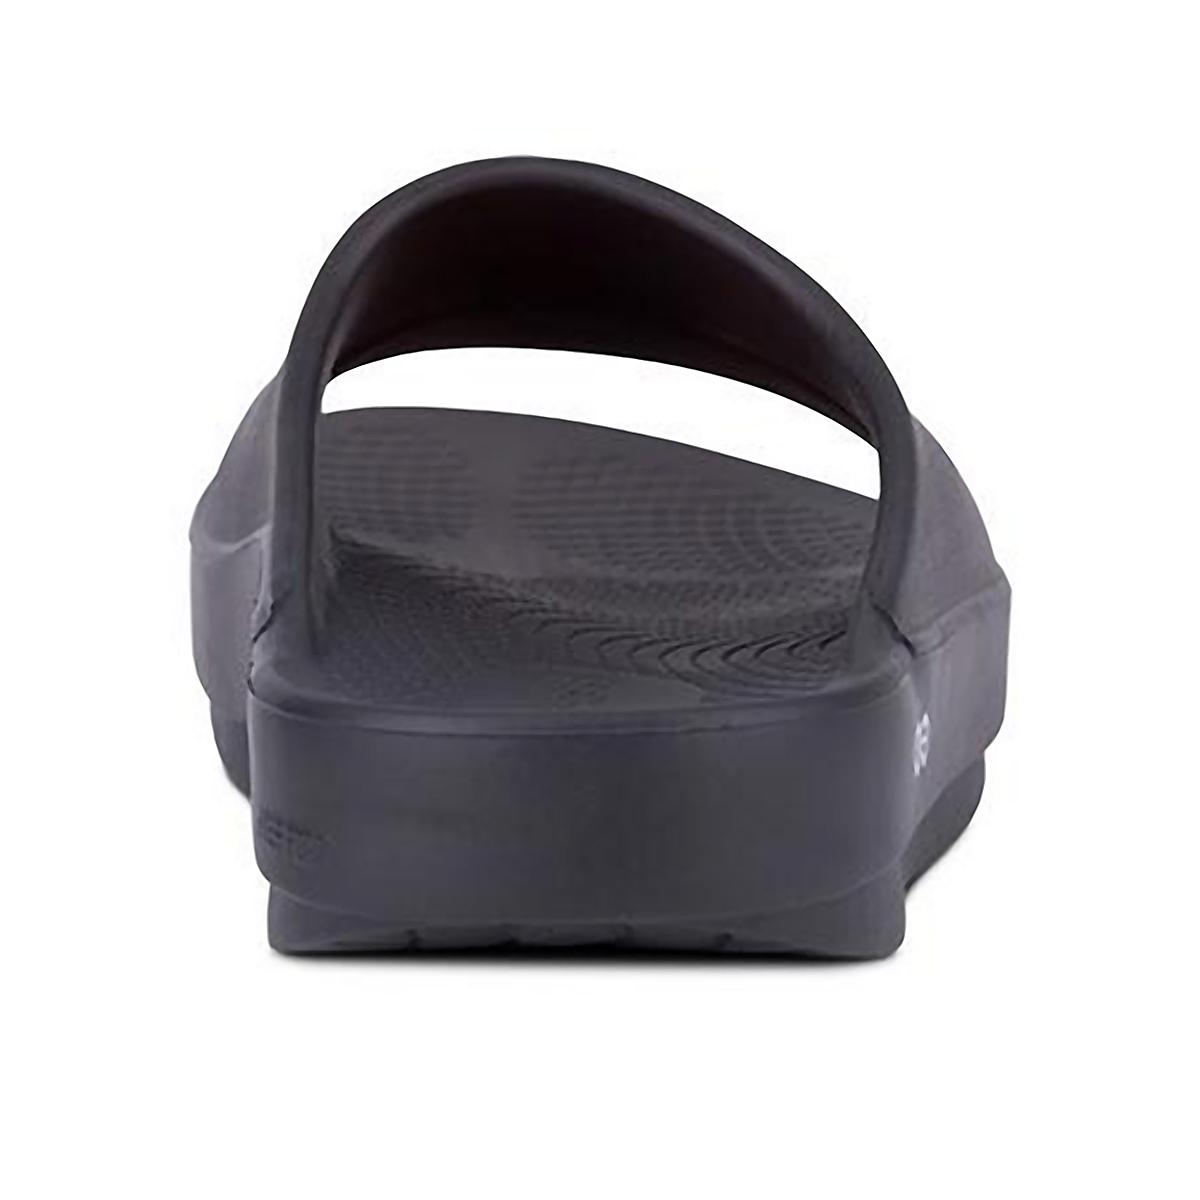 Oofos Ooahh Slide Recovery Sandal - Color: Black - Size: M7/W9 - Width: Regular, Black, large, image 4